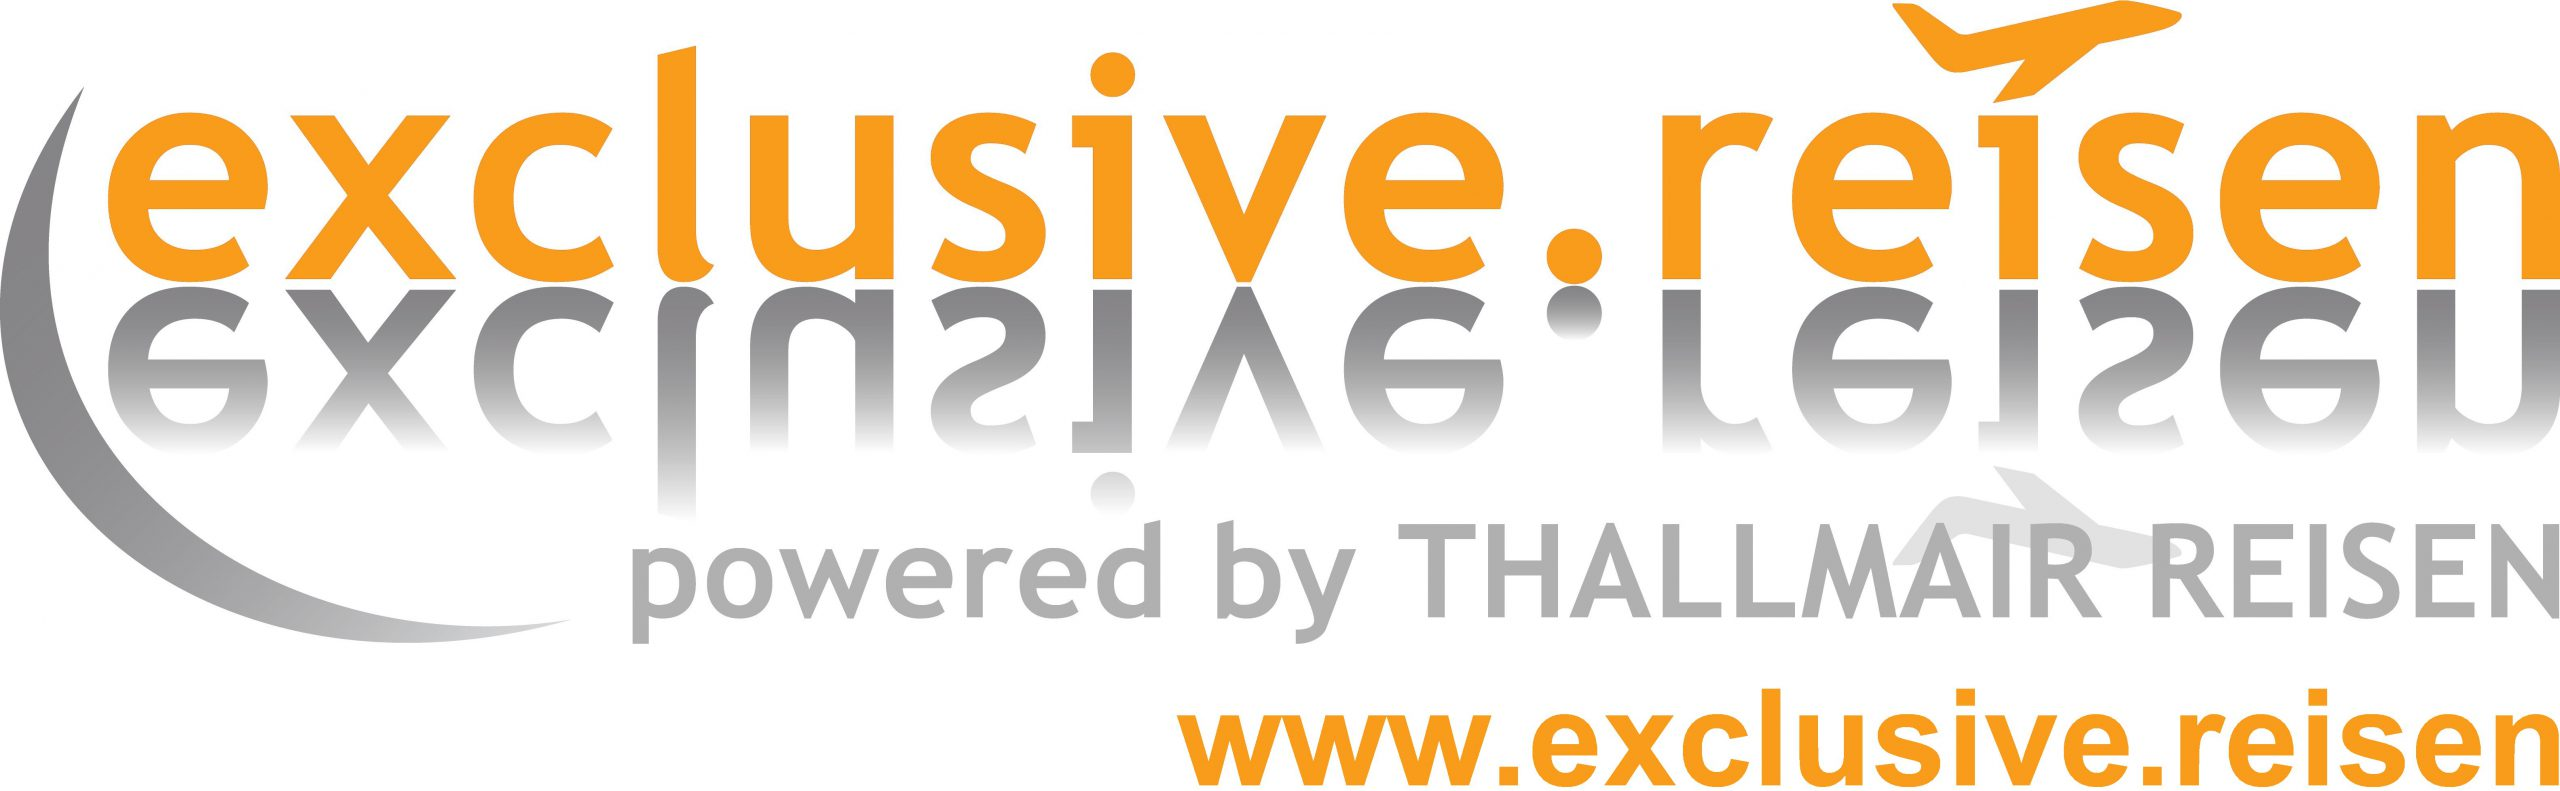 exclusive.reisen